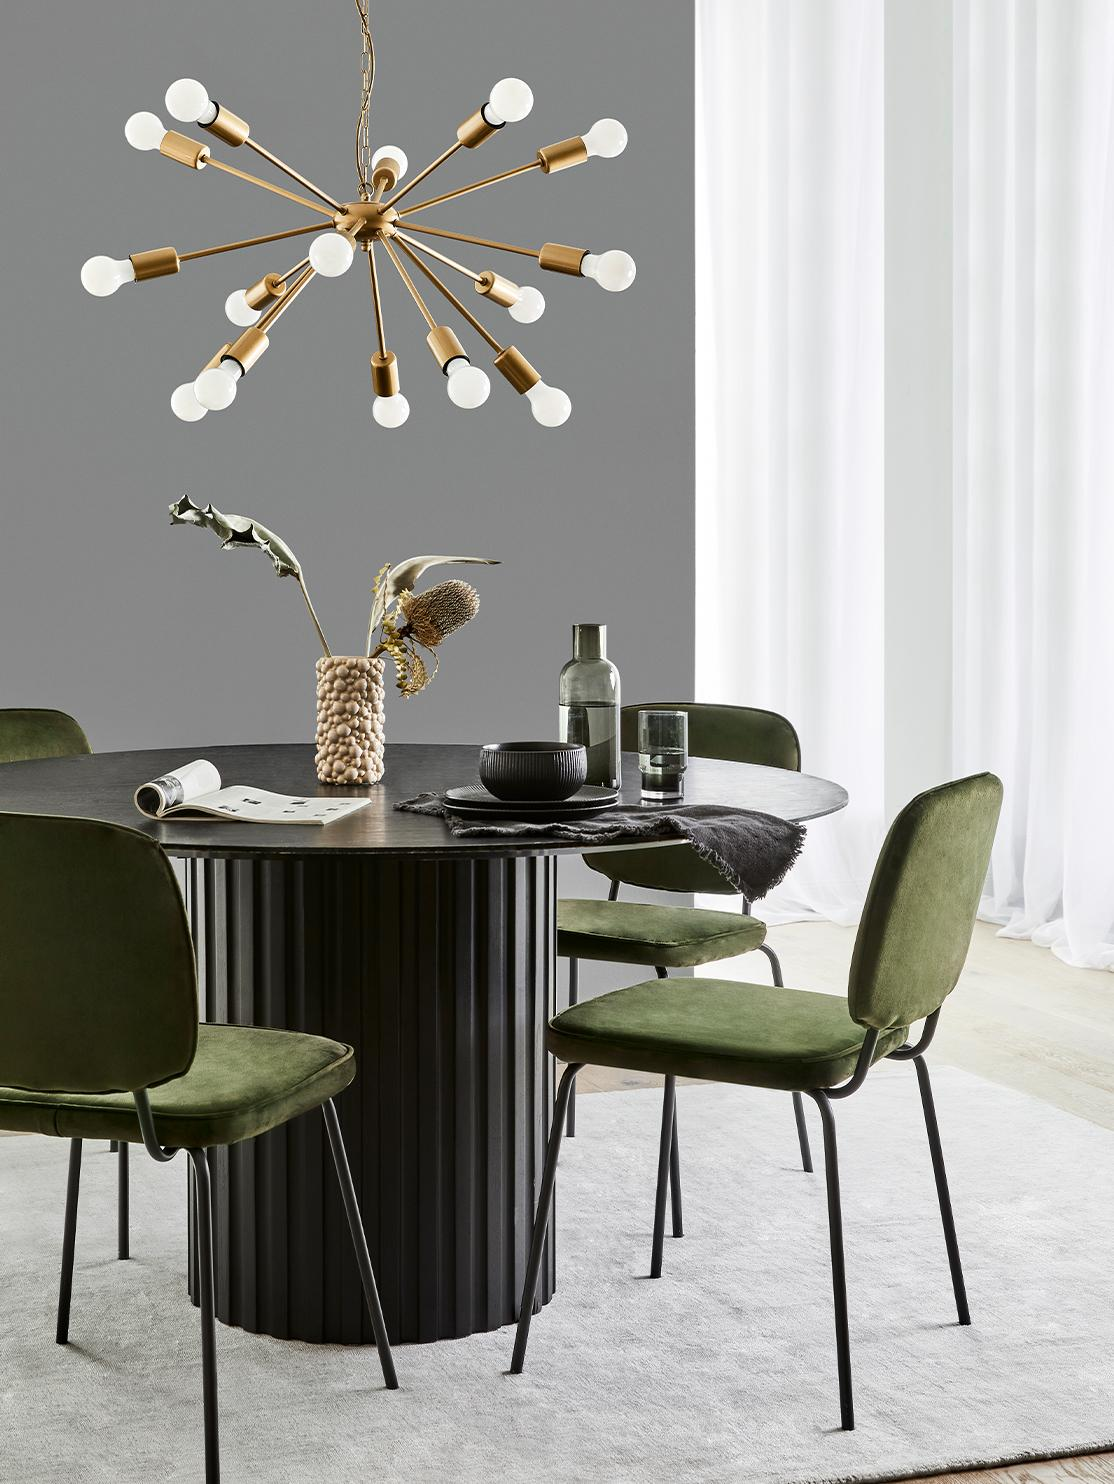 Design przy stole